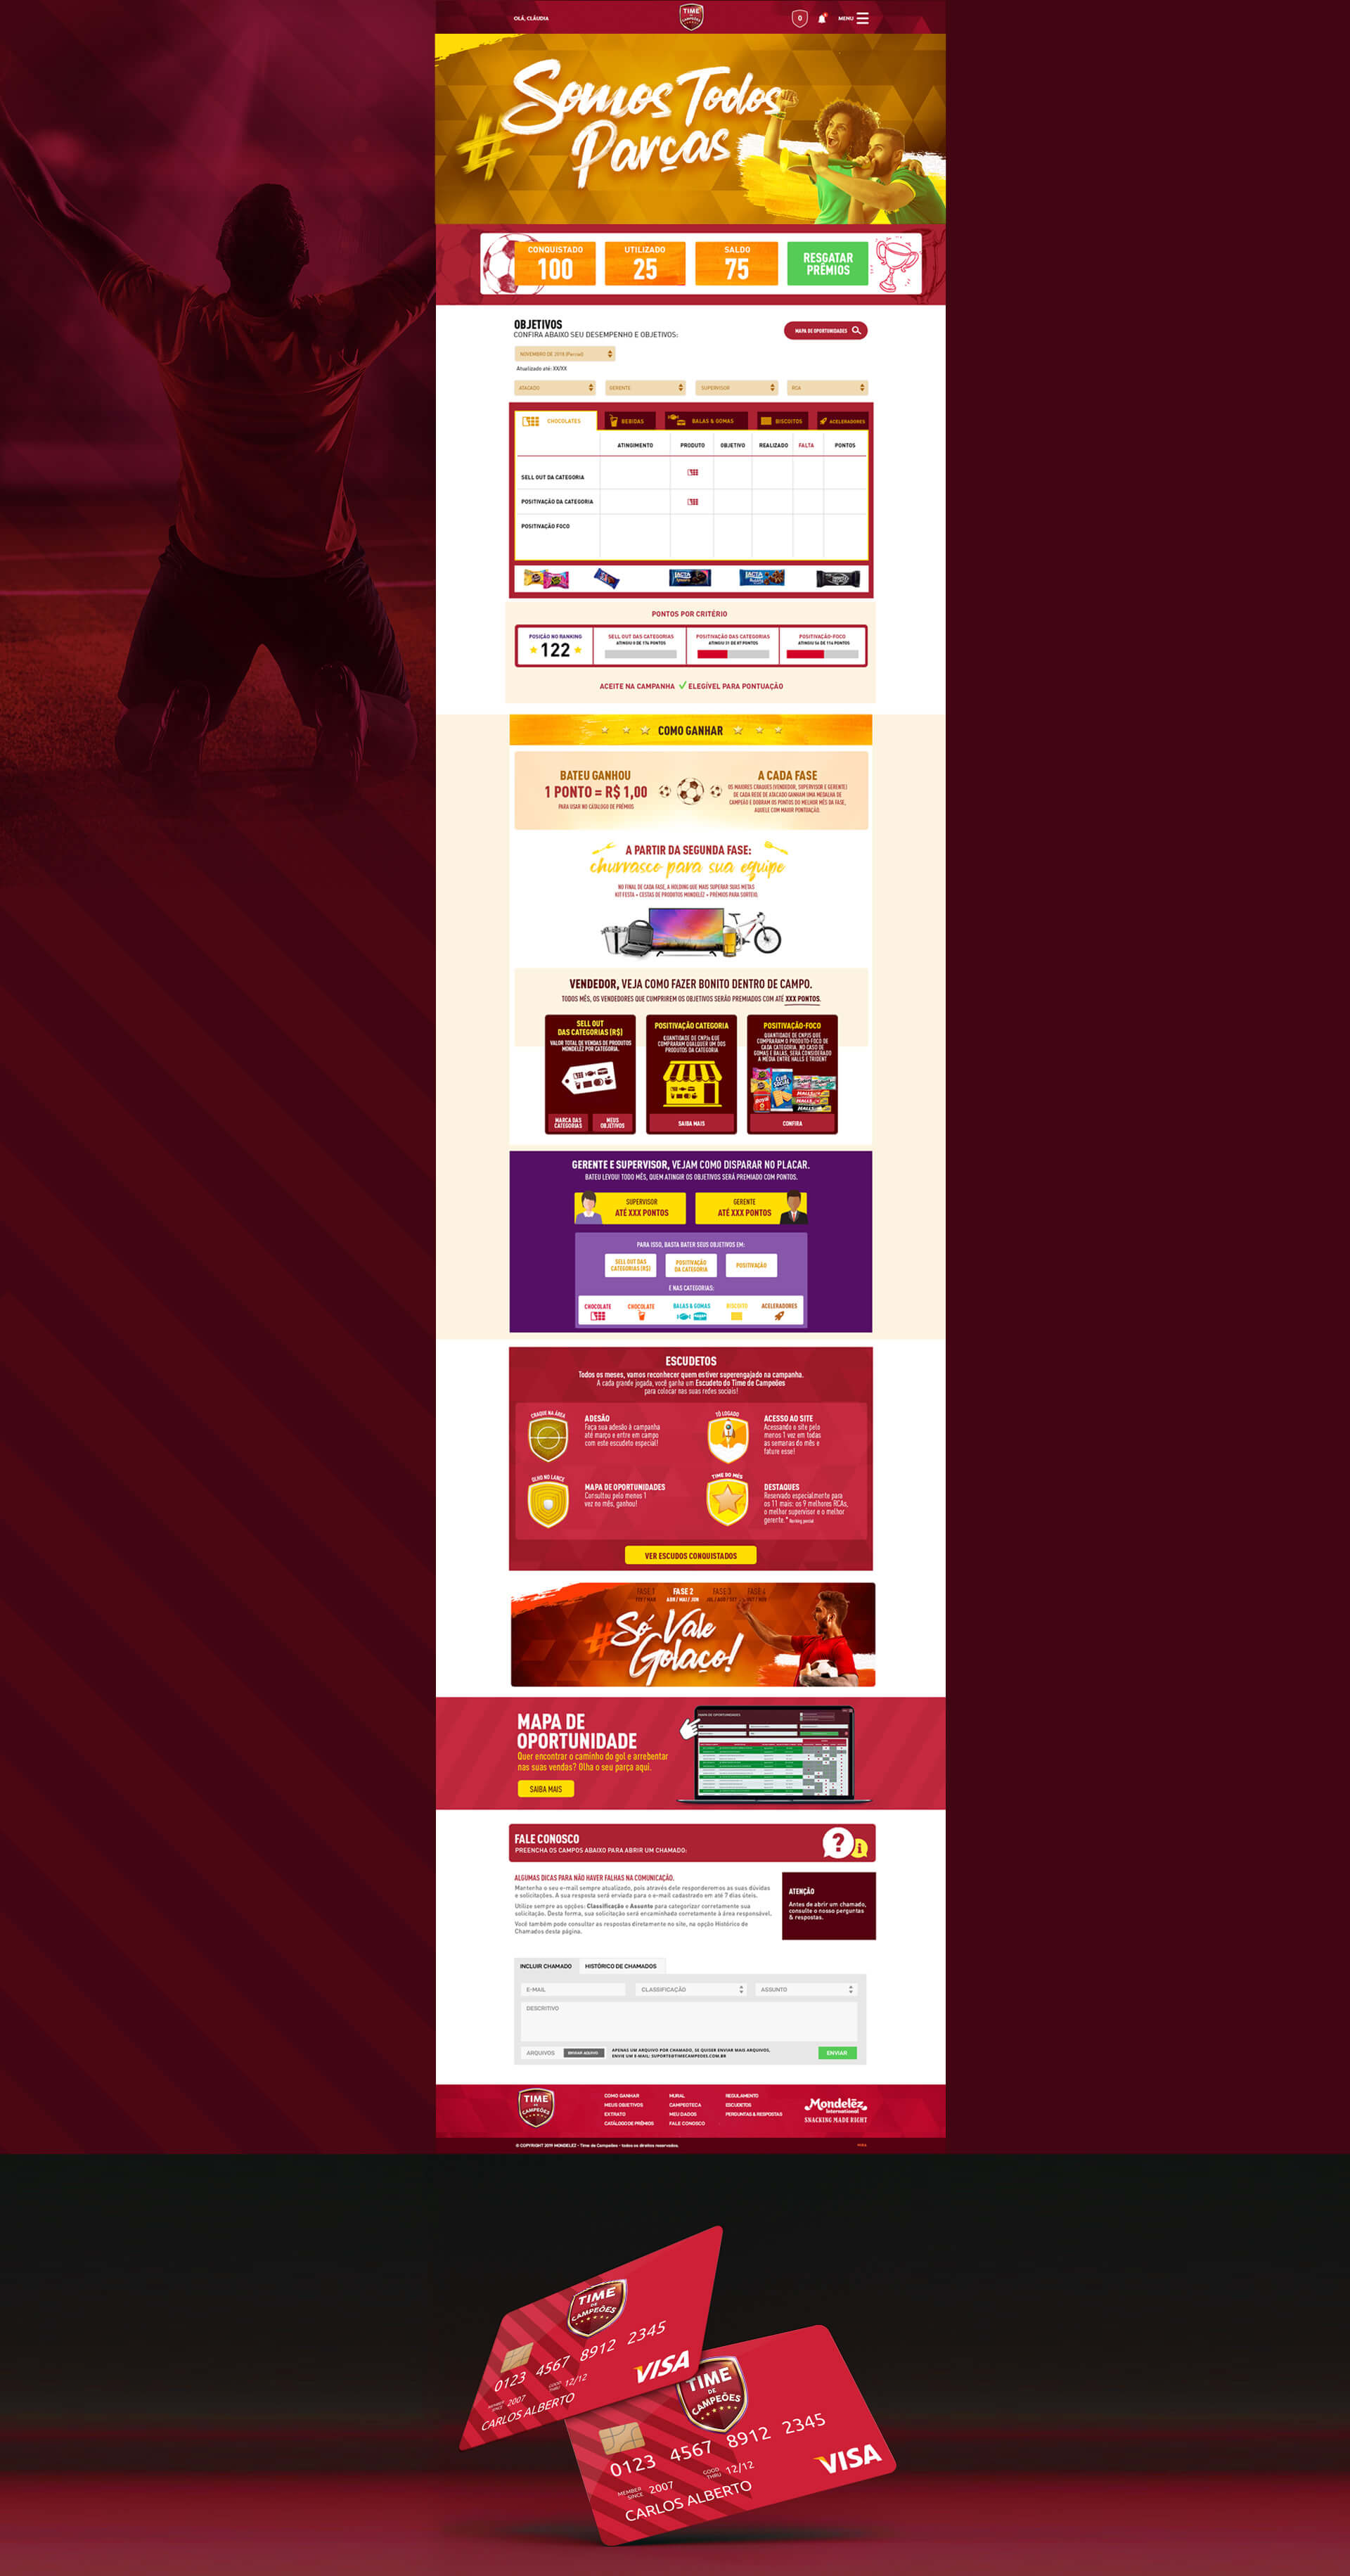 Mira Case Mondelez Trade Marketing Campanhas De